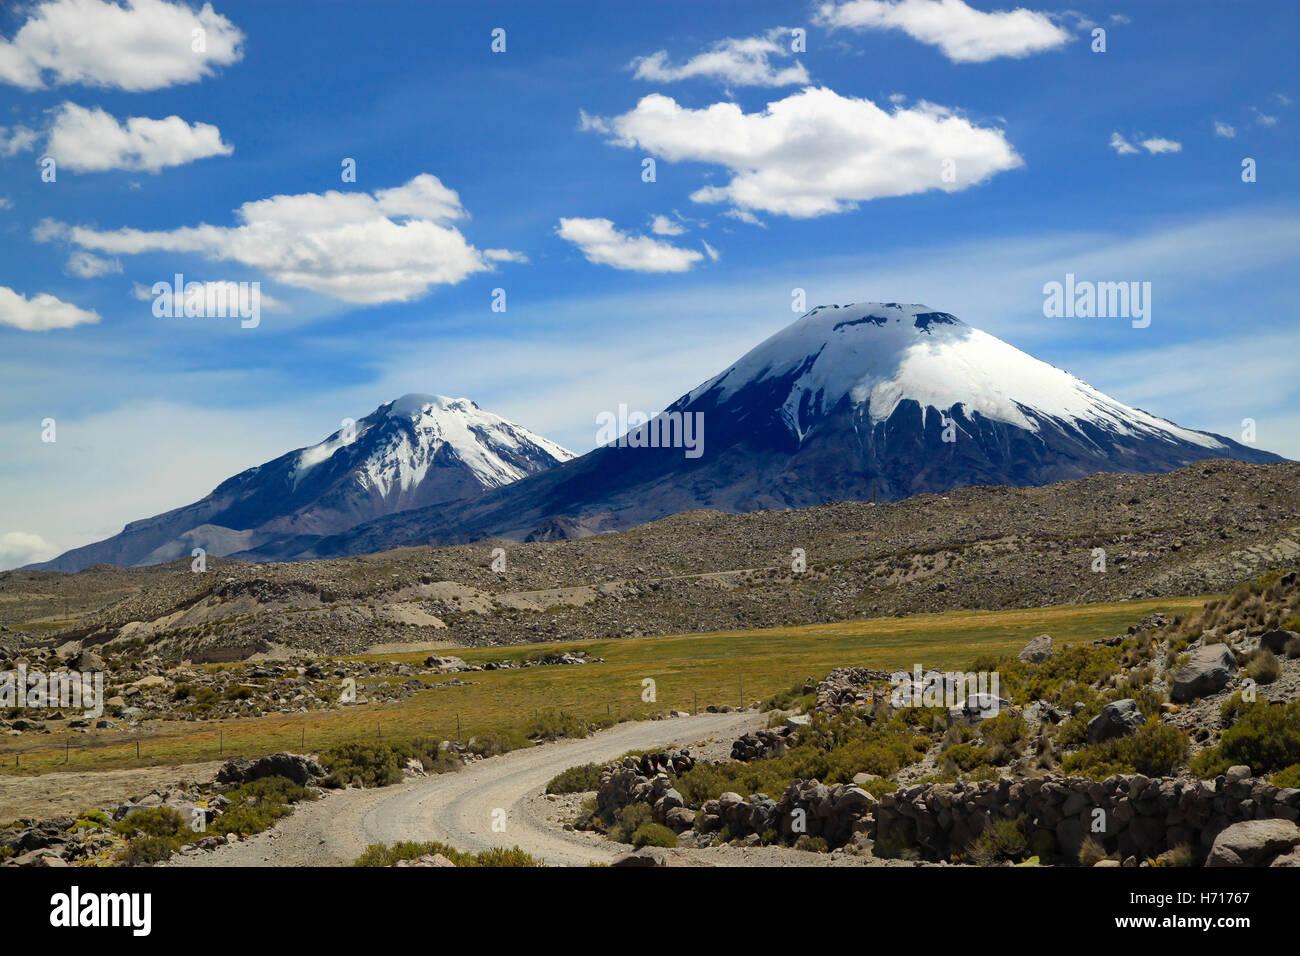 Vista escénica del grupo volcánico. Grupo volcánico Payachata al Parque Nacional Lauca, Chile Imagen De Stock